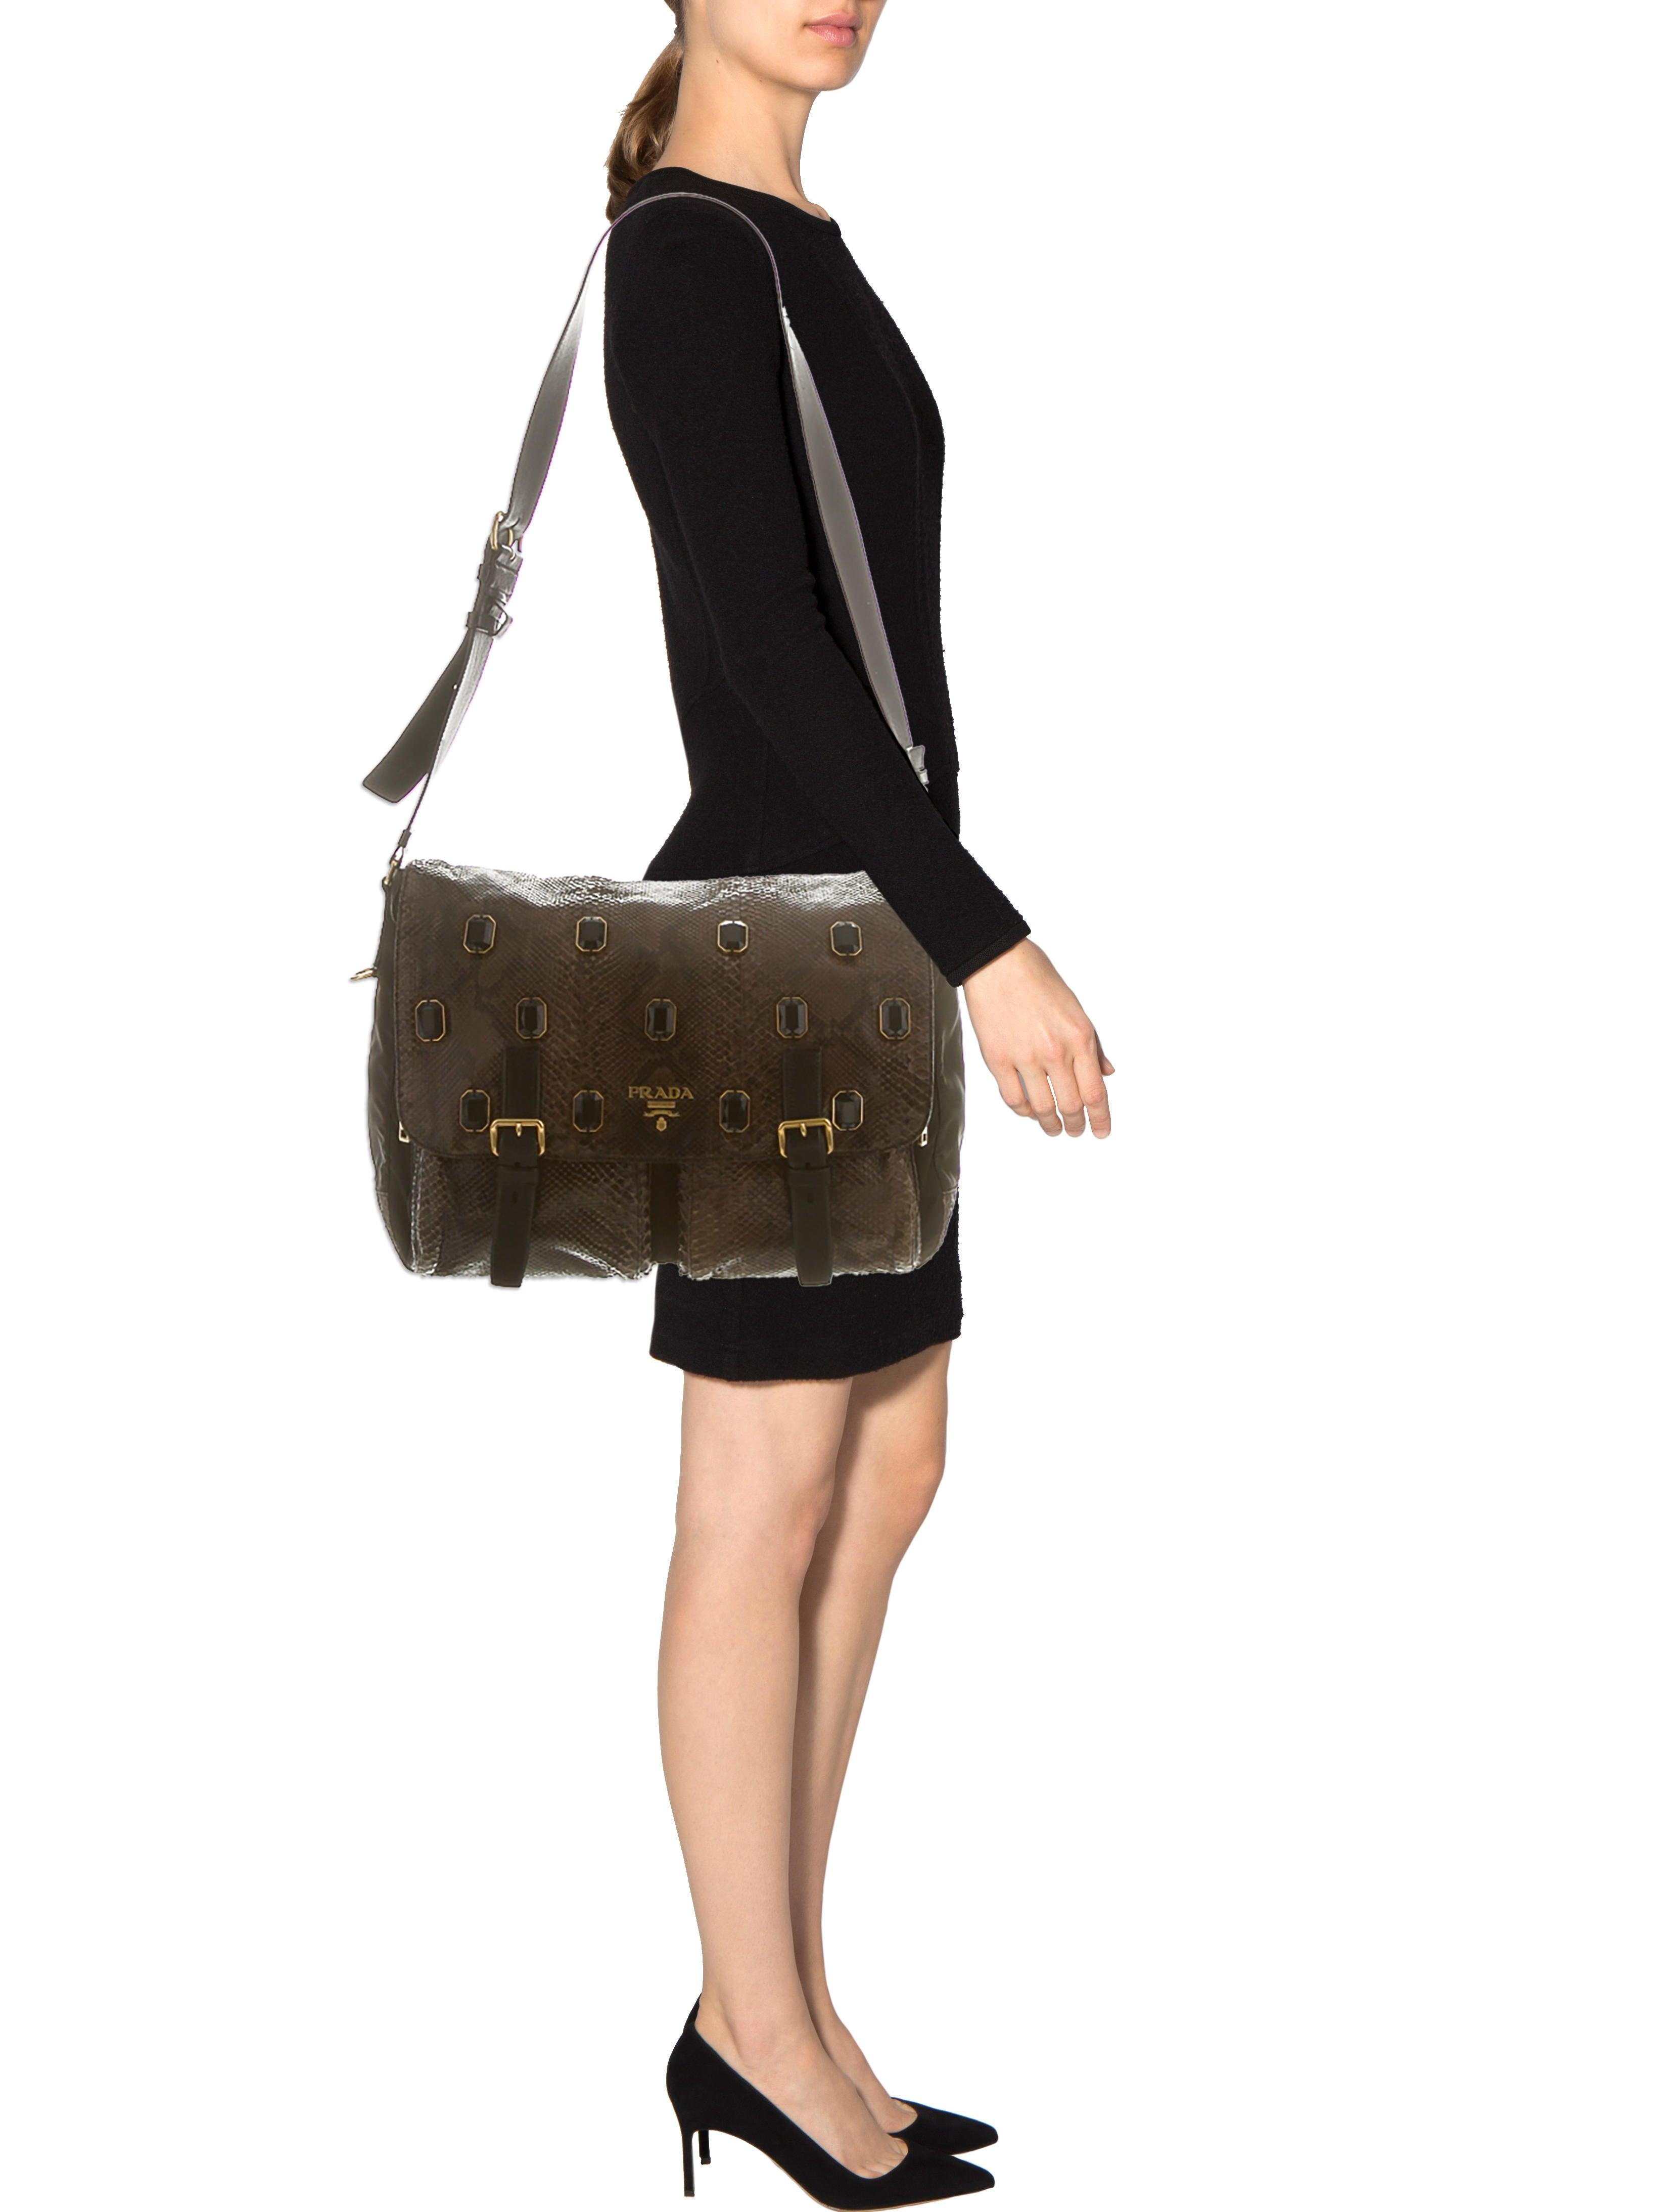 faux prada - Prada Python Jewel Messenger Bag - Handbags - PRA59969   The RealReal